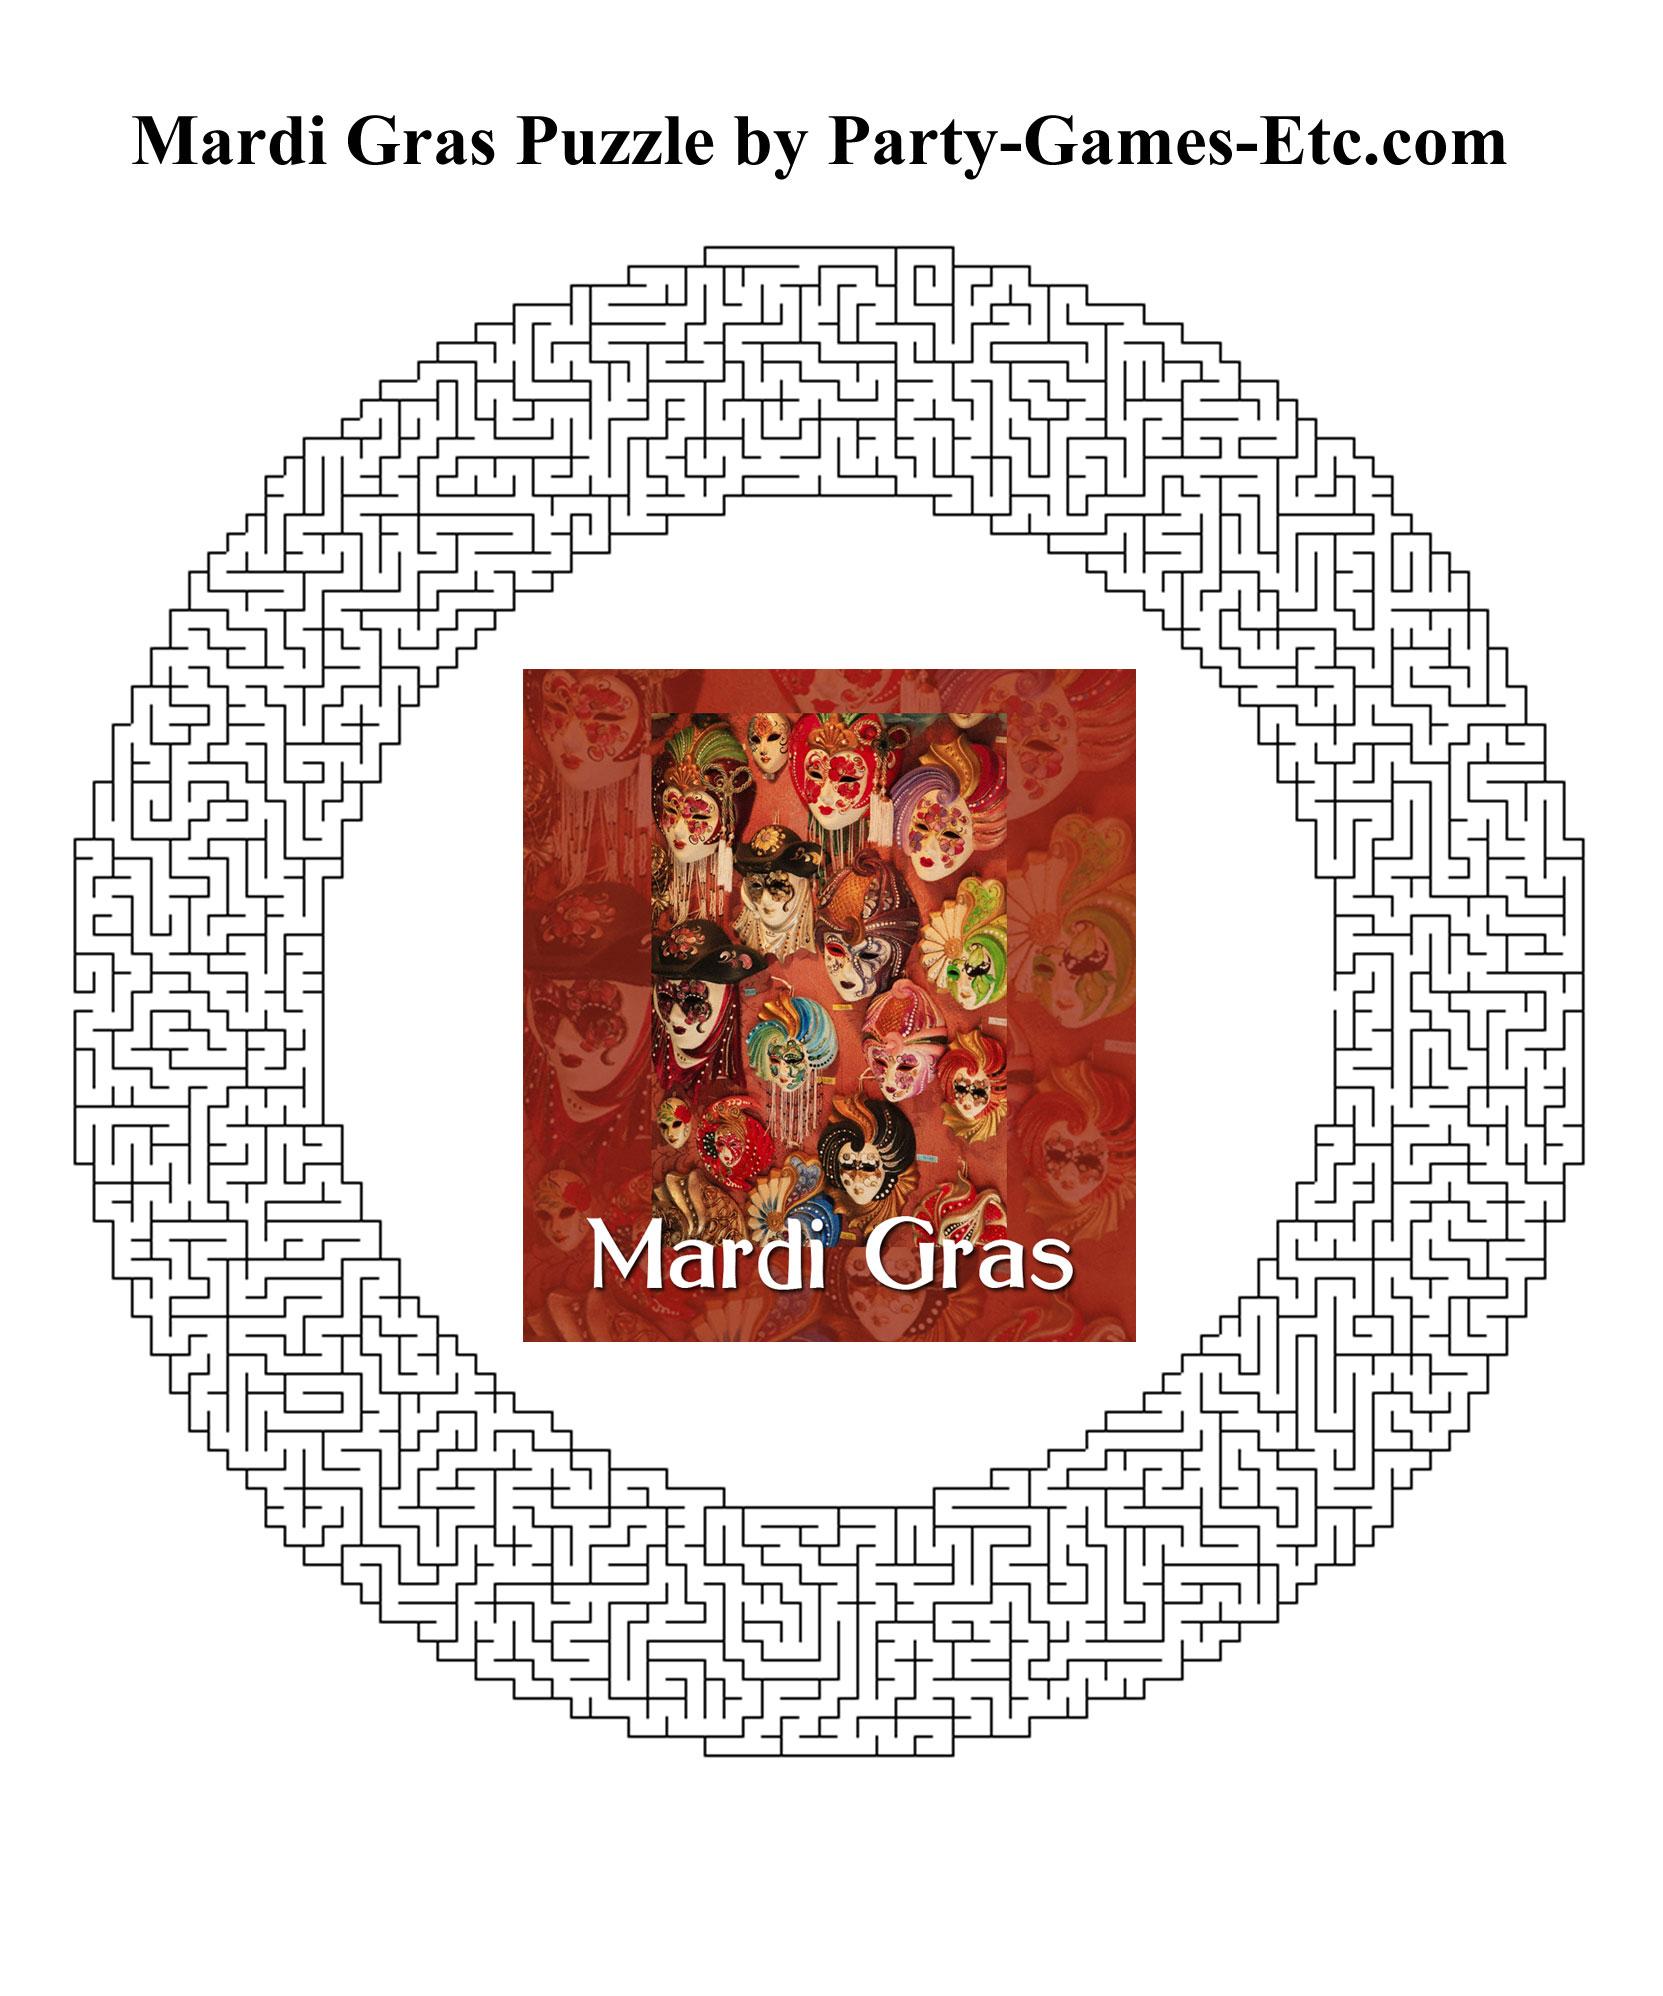 Mardi Gras Party Games, Free Printable Games And Activities For A - Free Printable Mardi Gras Games